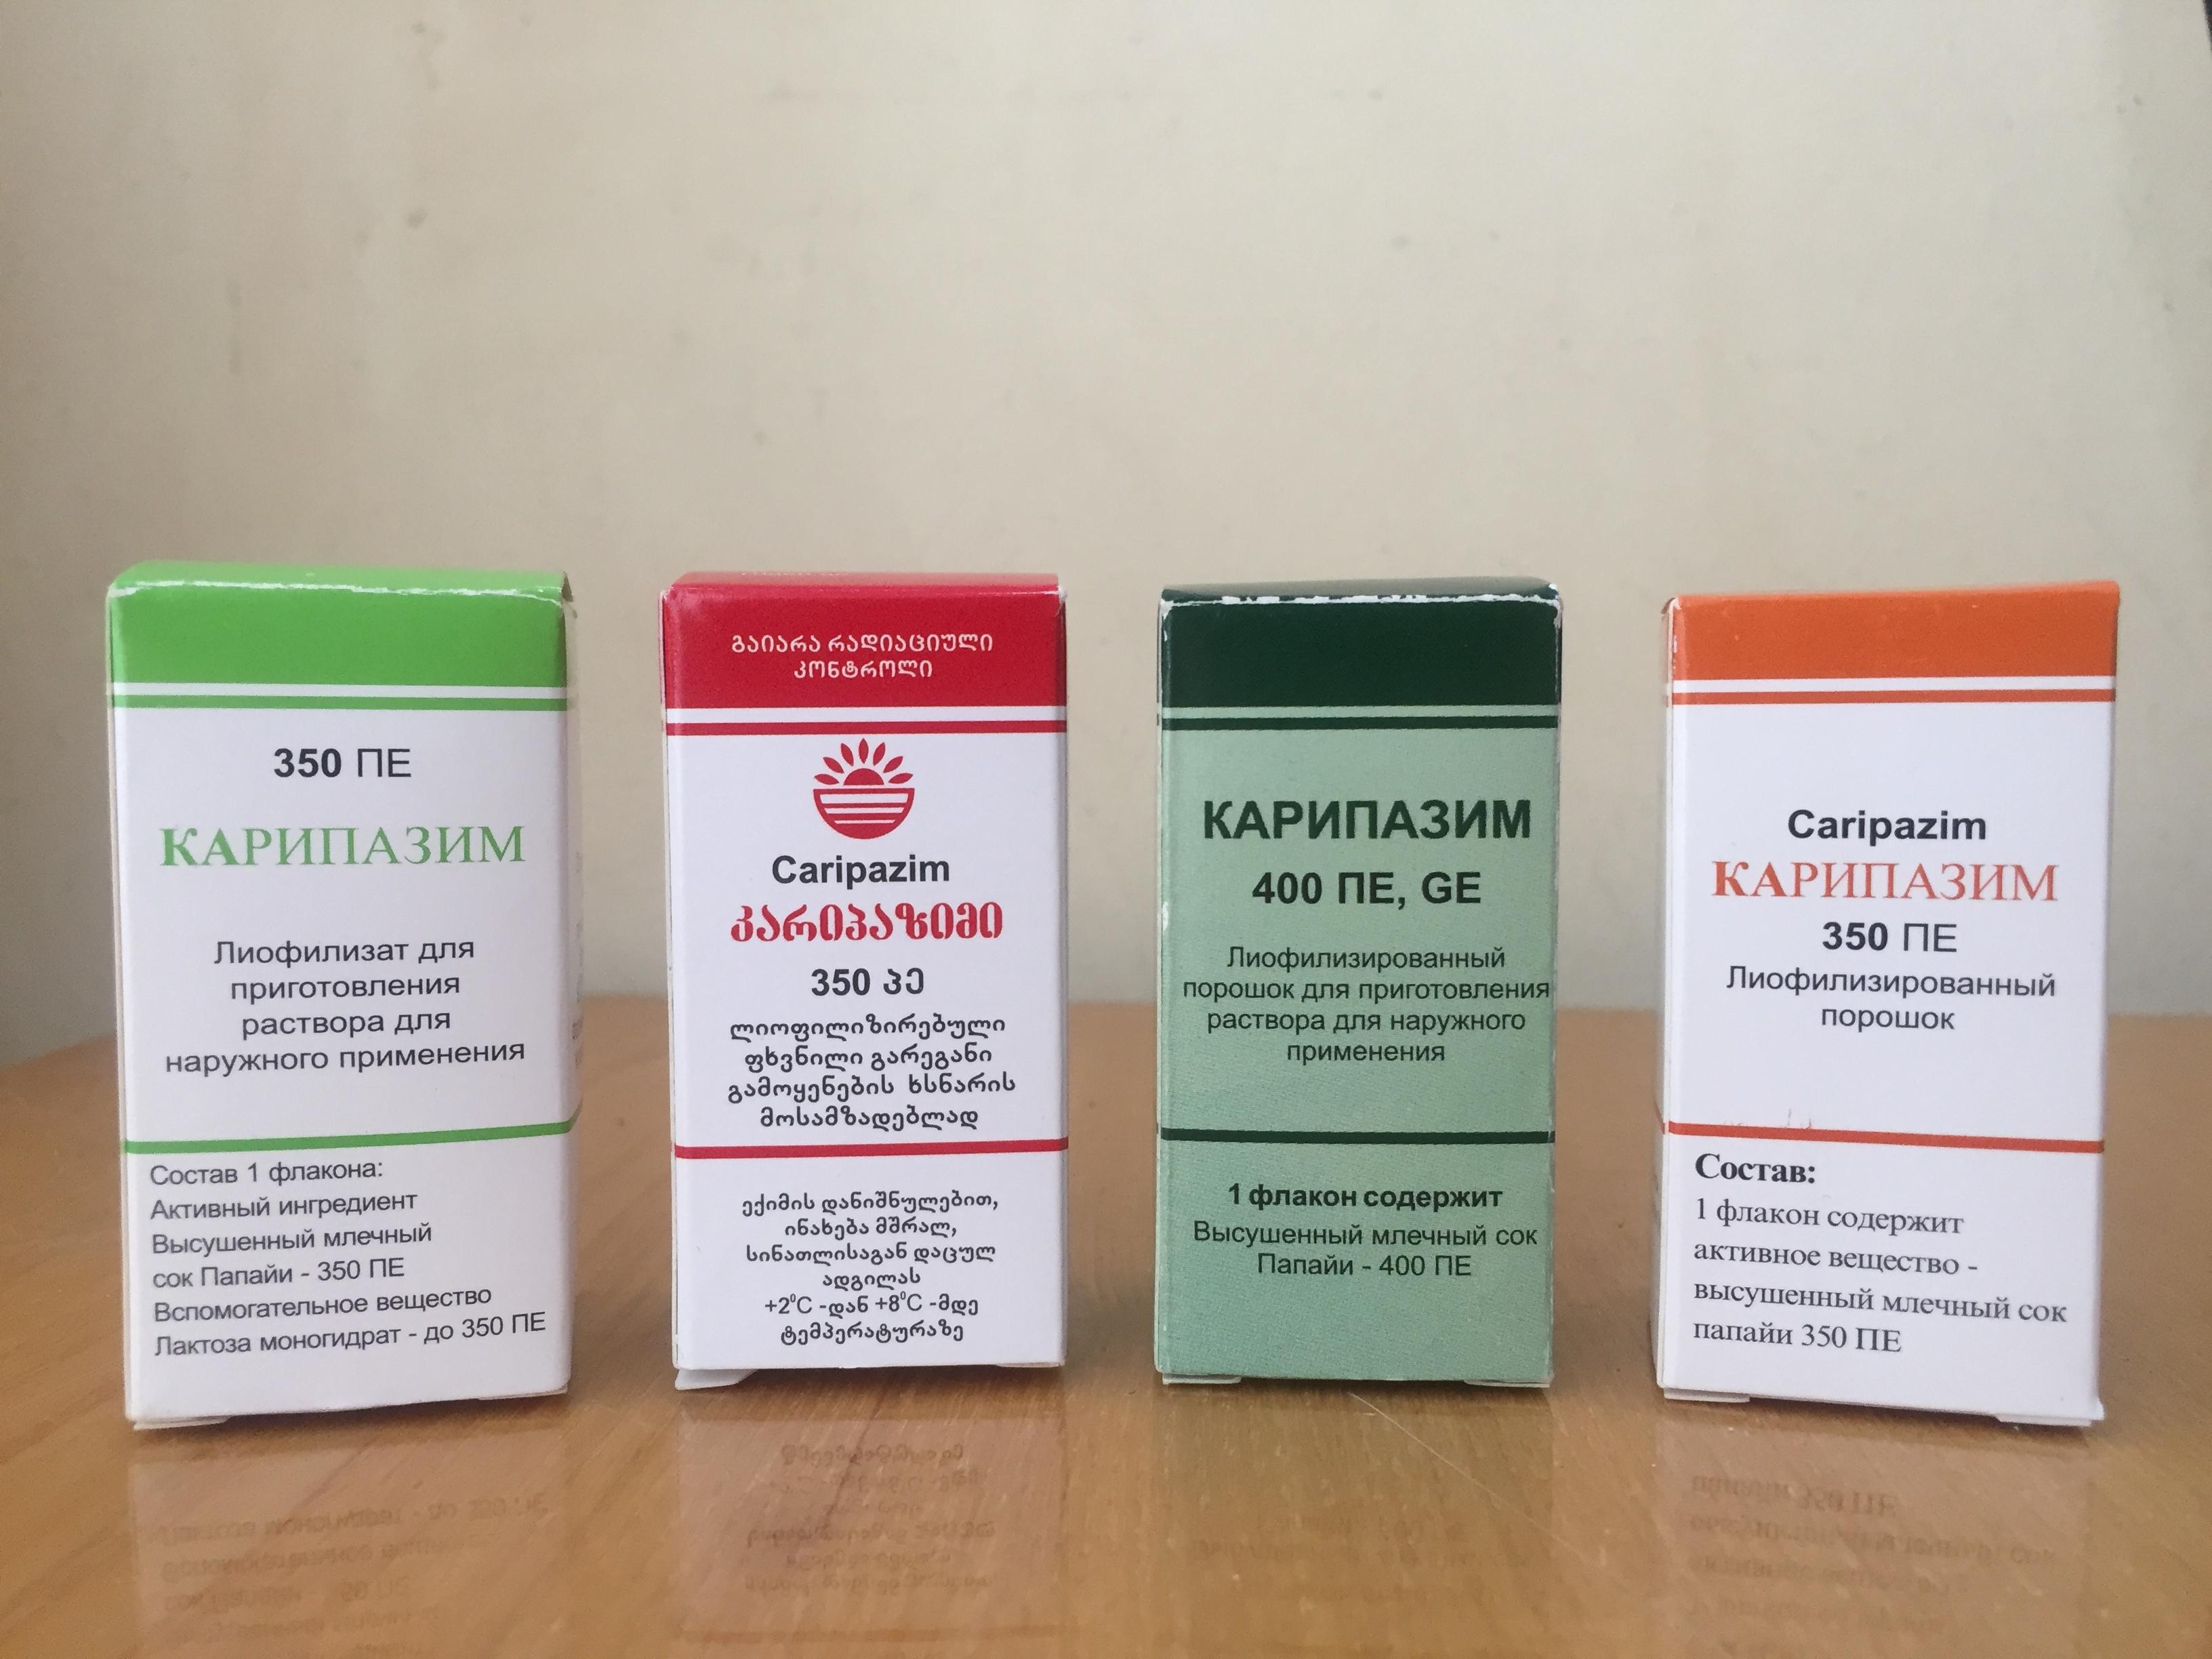 Caripazim® - Armenia